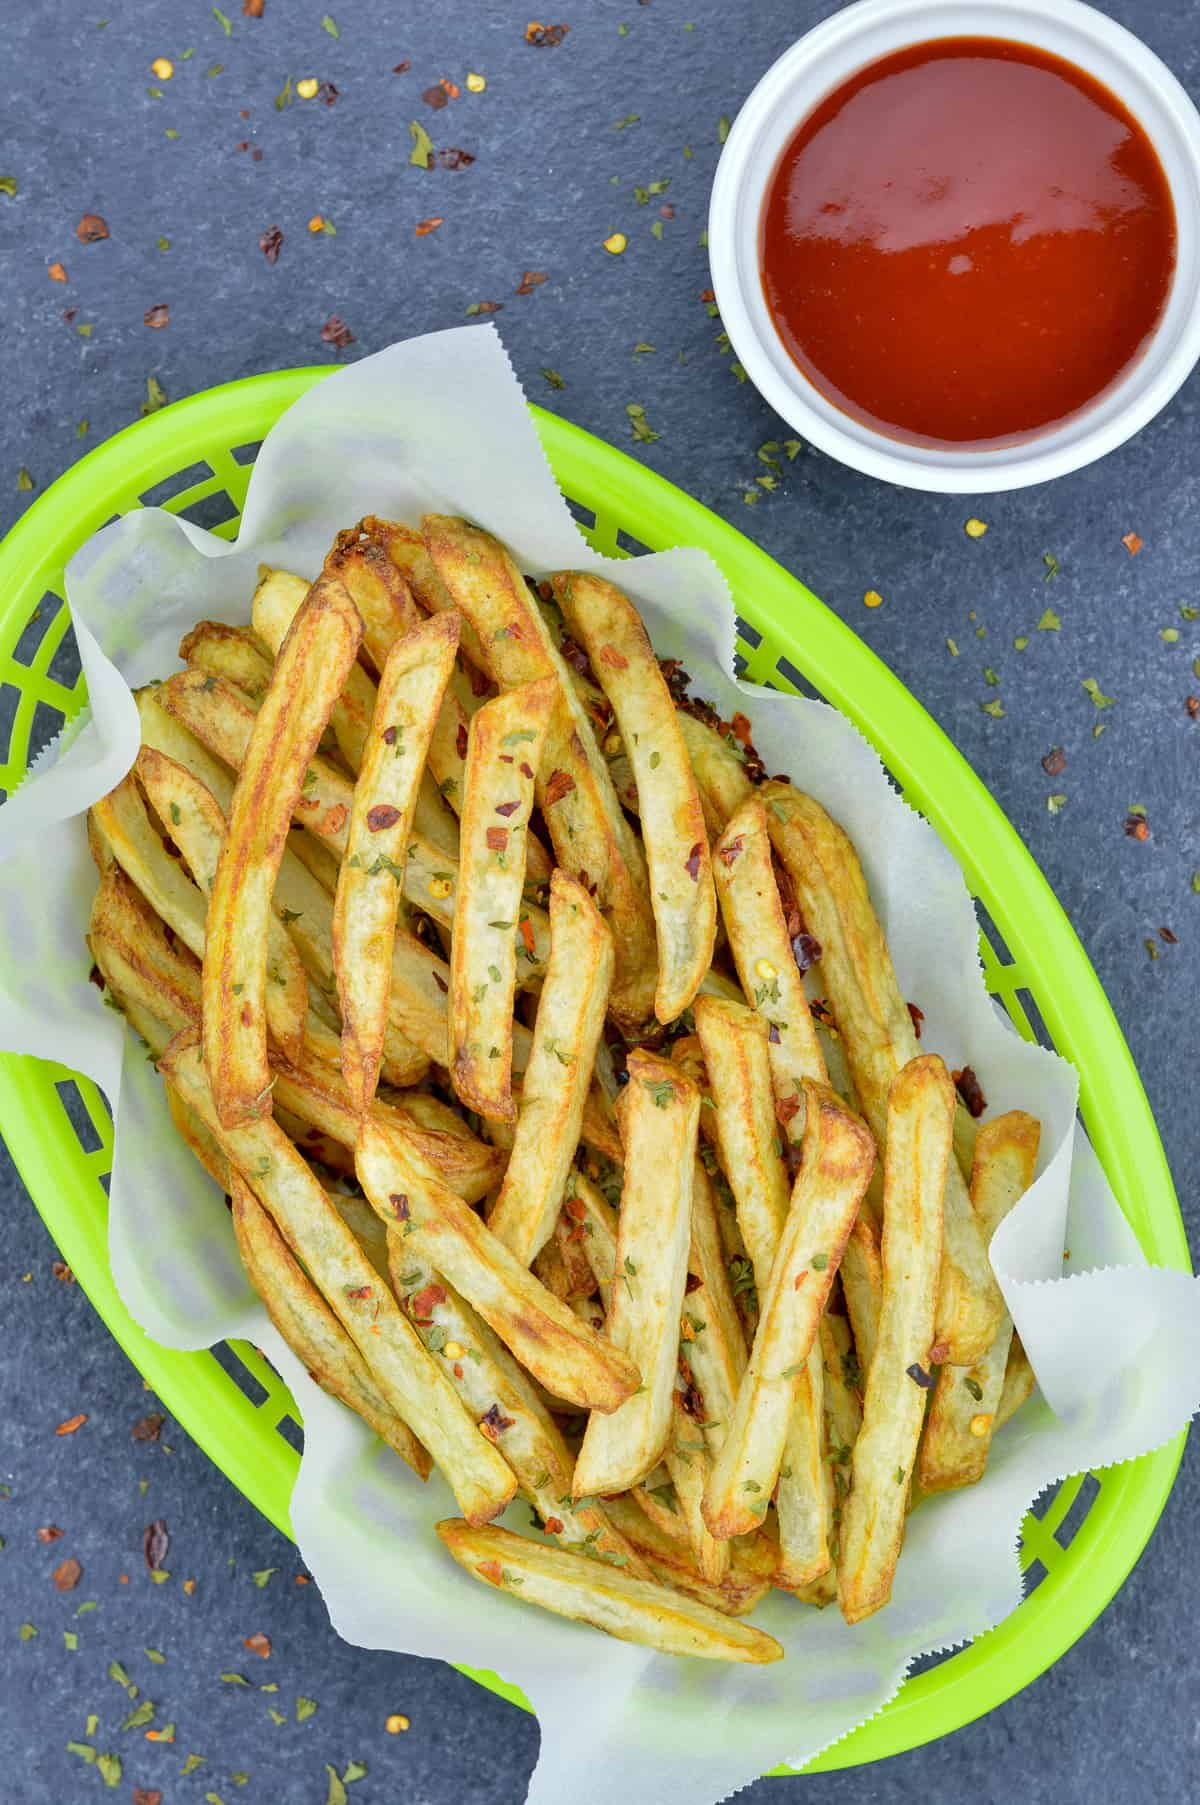 Air Fryer French Fries 2 Ways (Air Fryer + CrispLid